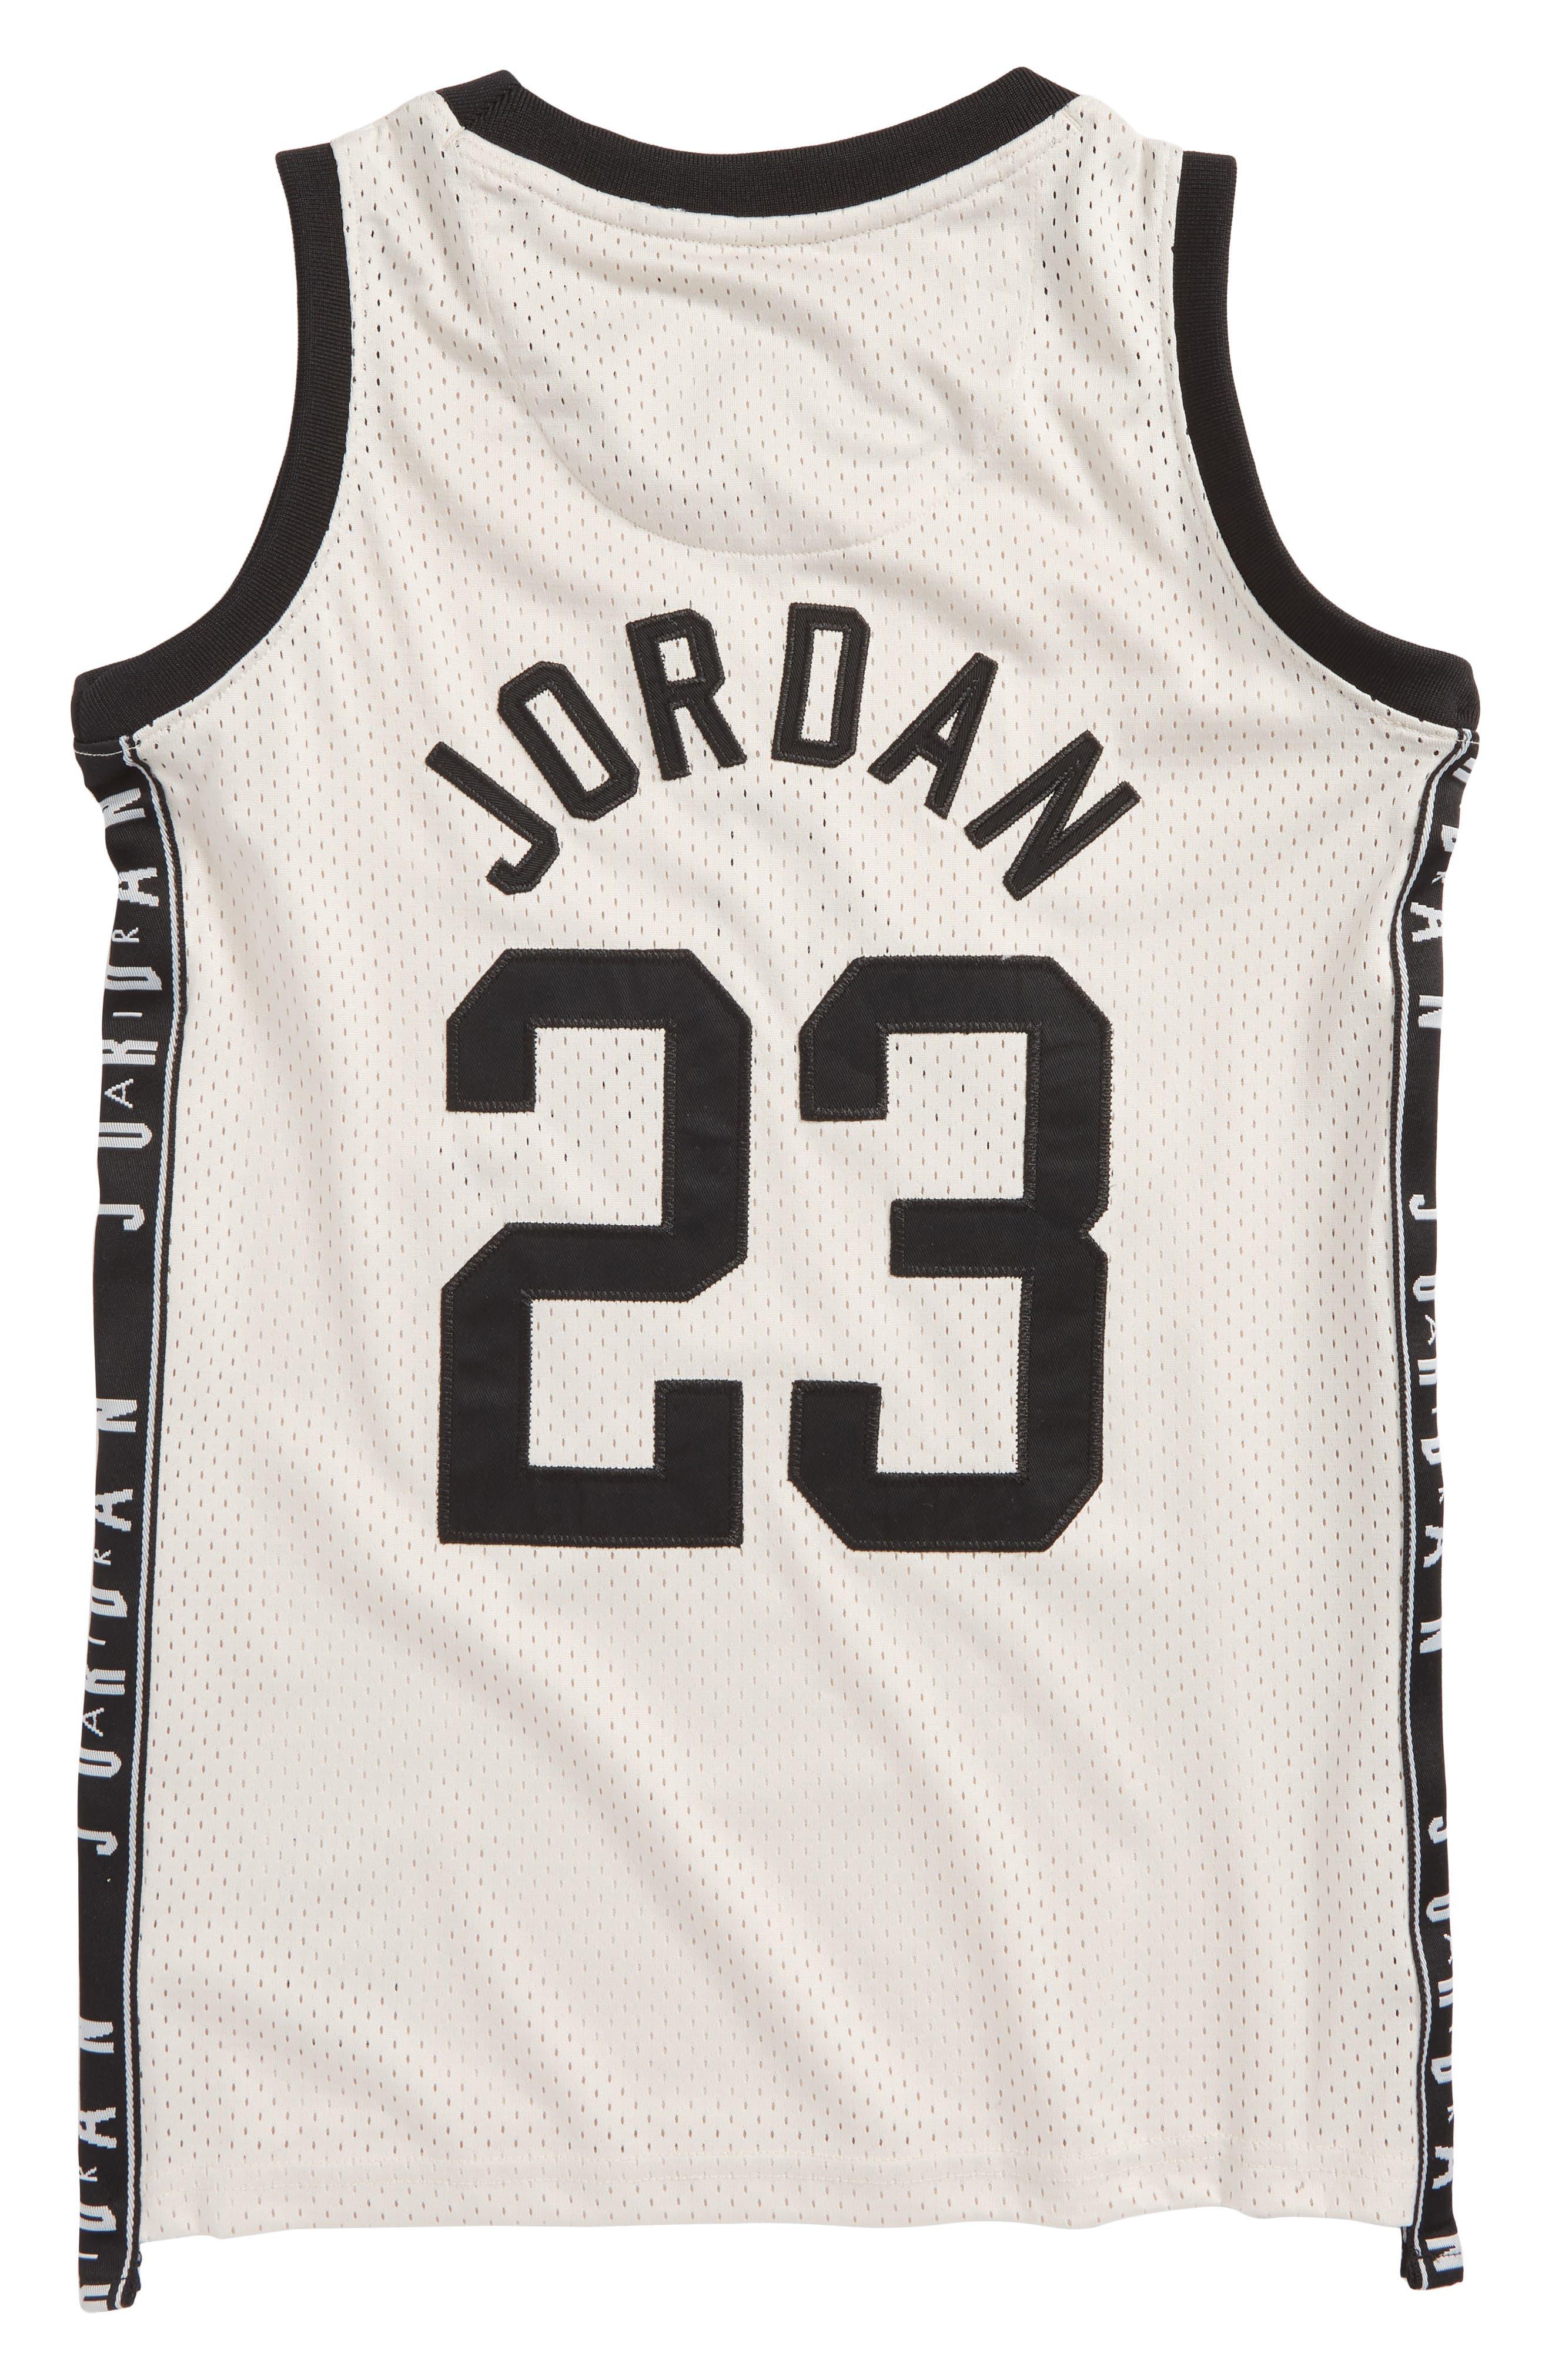 Jordan Rise Graphic Tape Jersey,                             Alternate thumbnail 2, color,                             Desert Sand